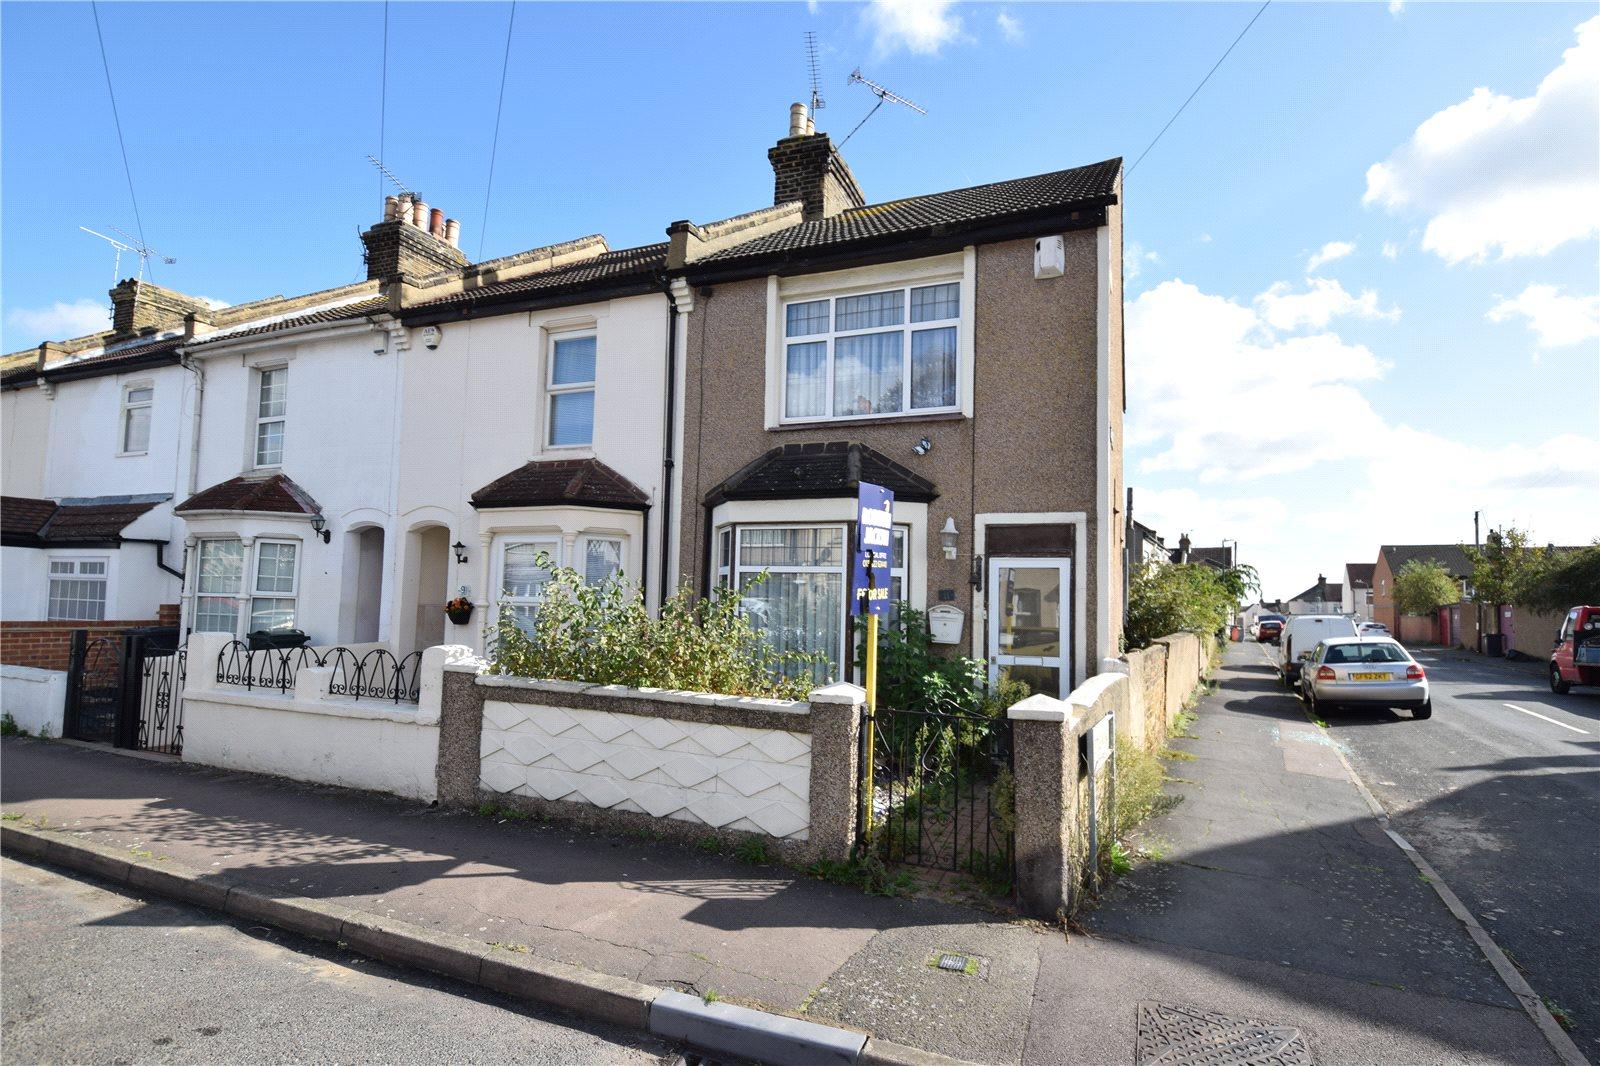 Eglinton Road, Swanscombe, Kent, DA10